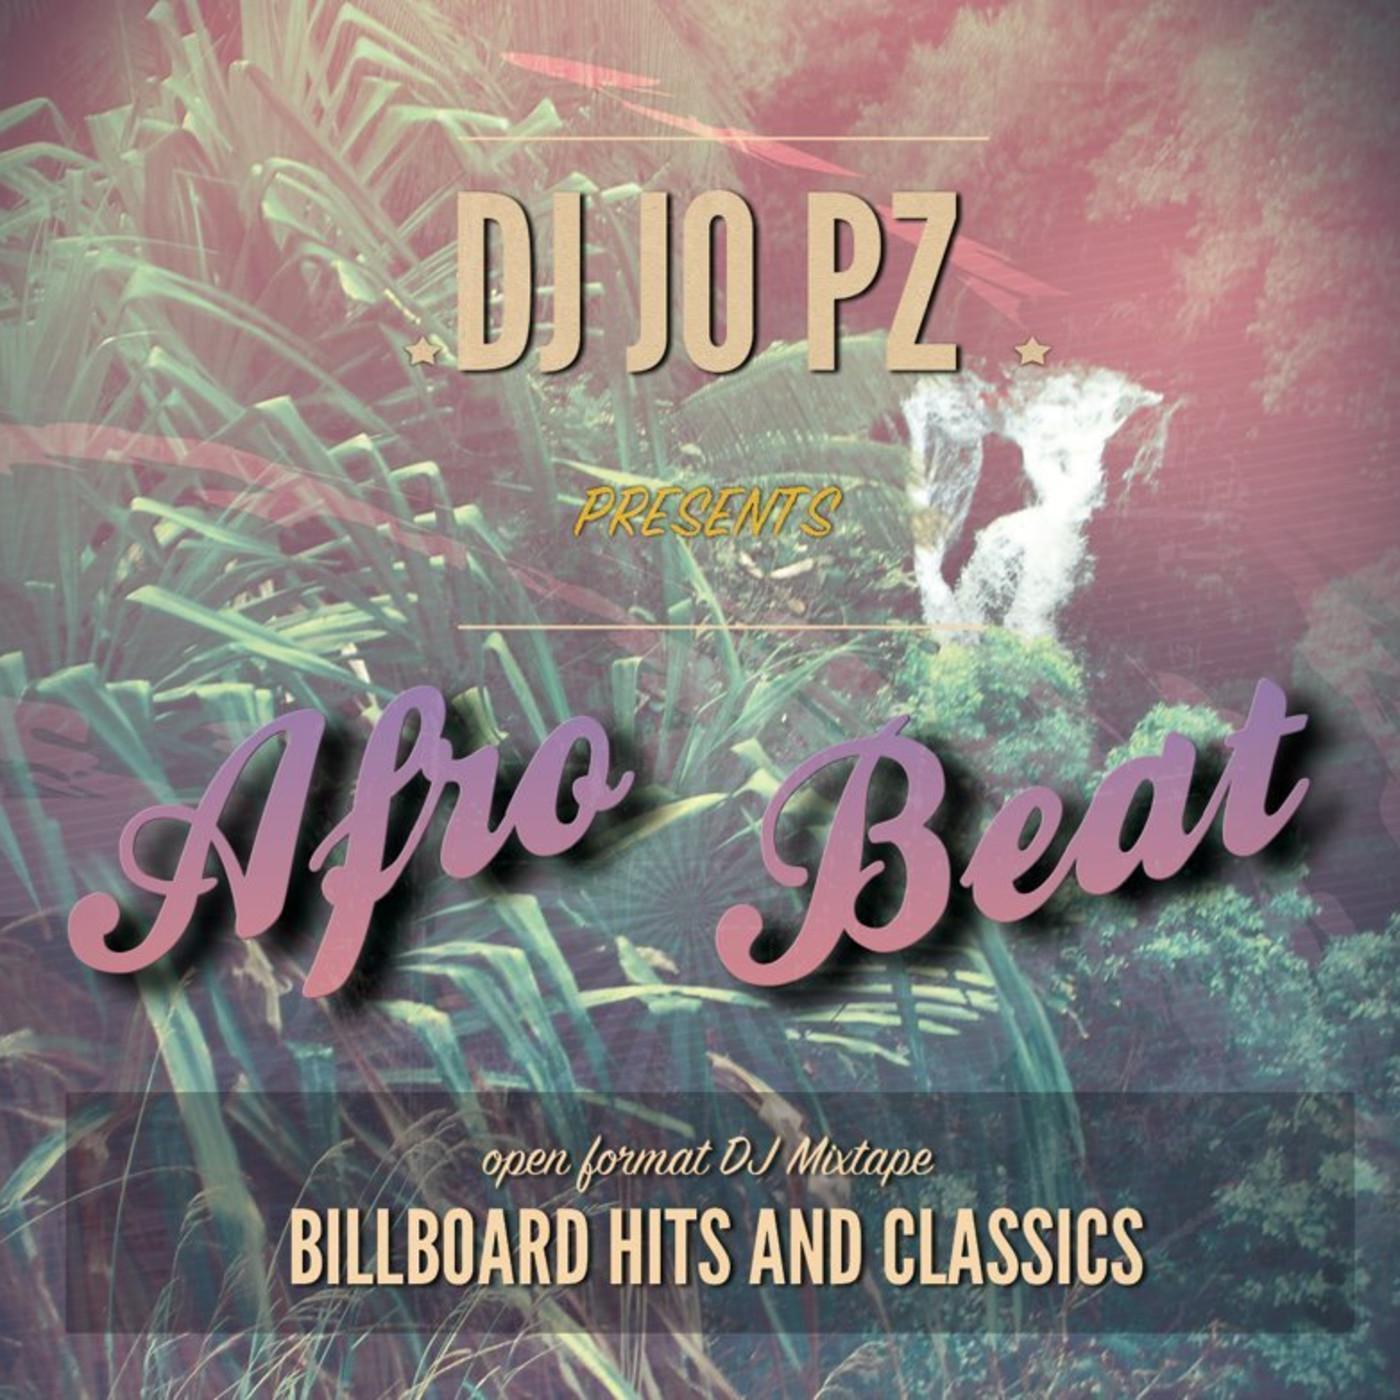 DJ JO PZ Party Mixtape Volumes (podcast) - DJ JO PZ | Listen